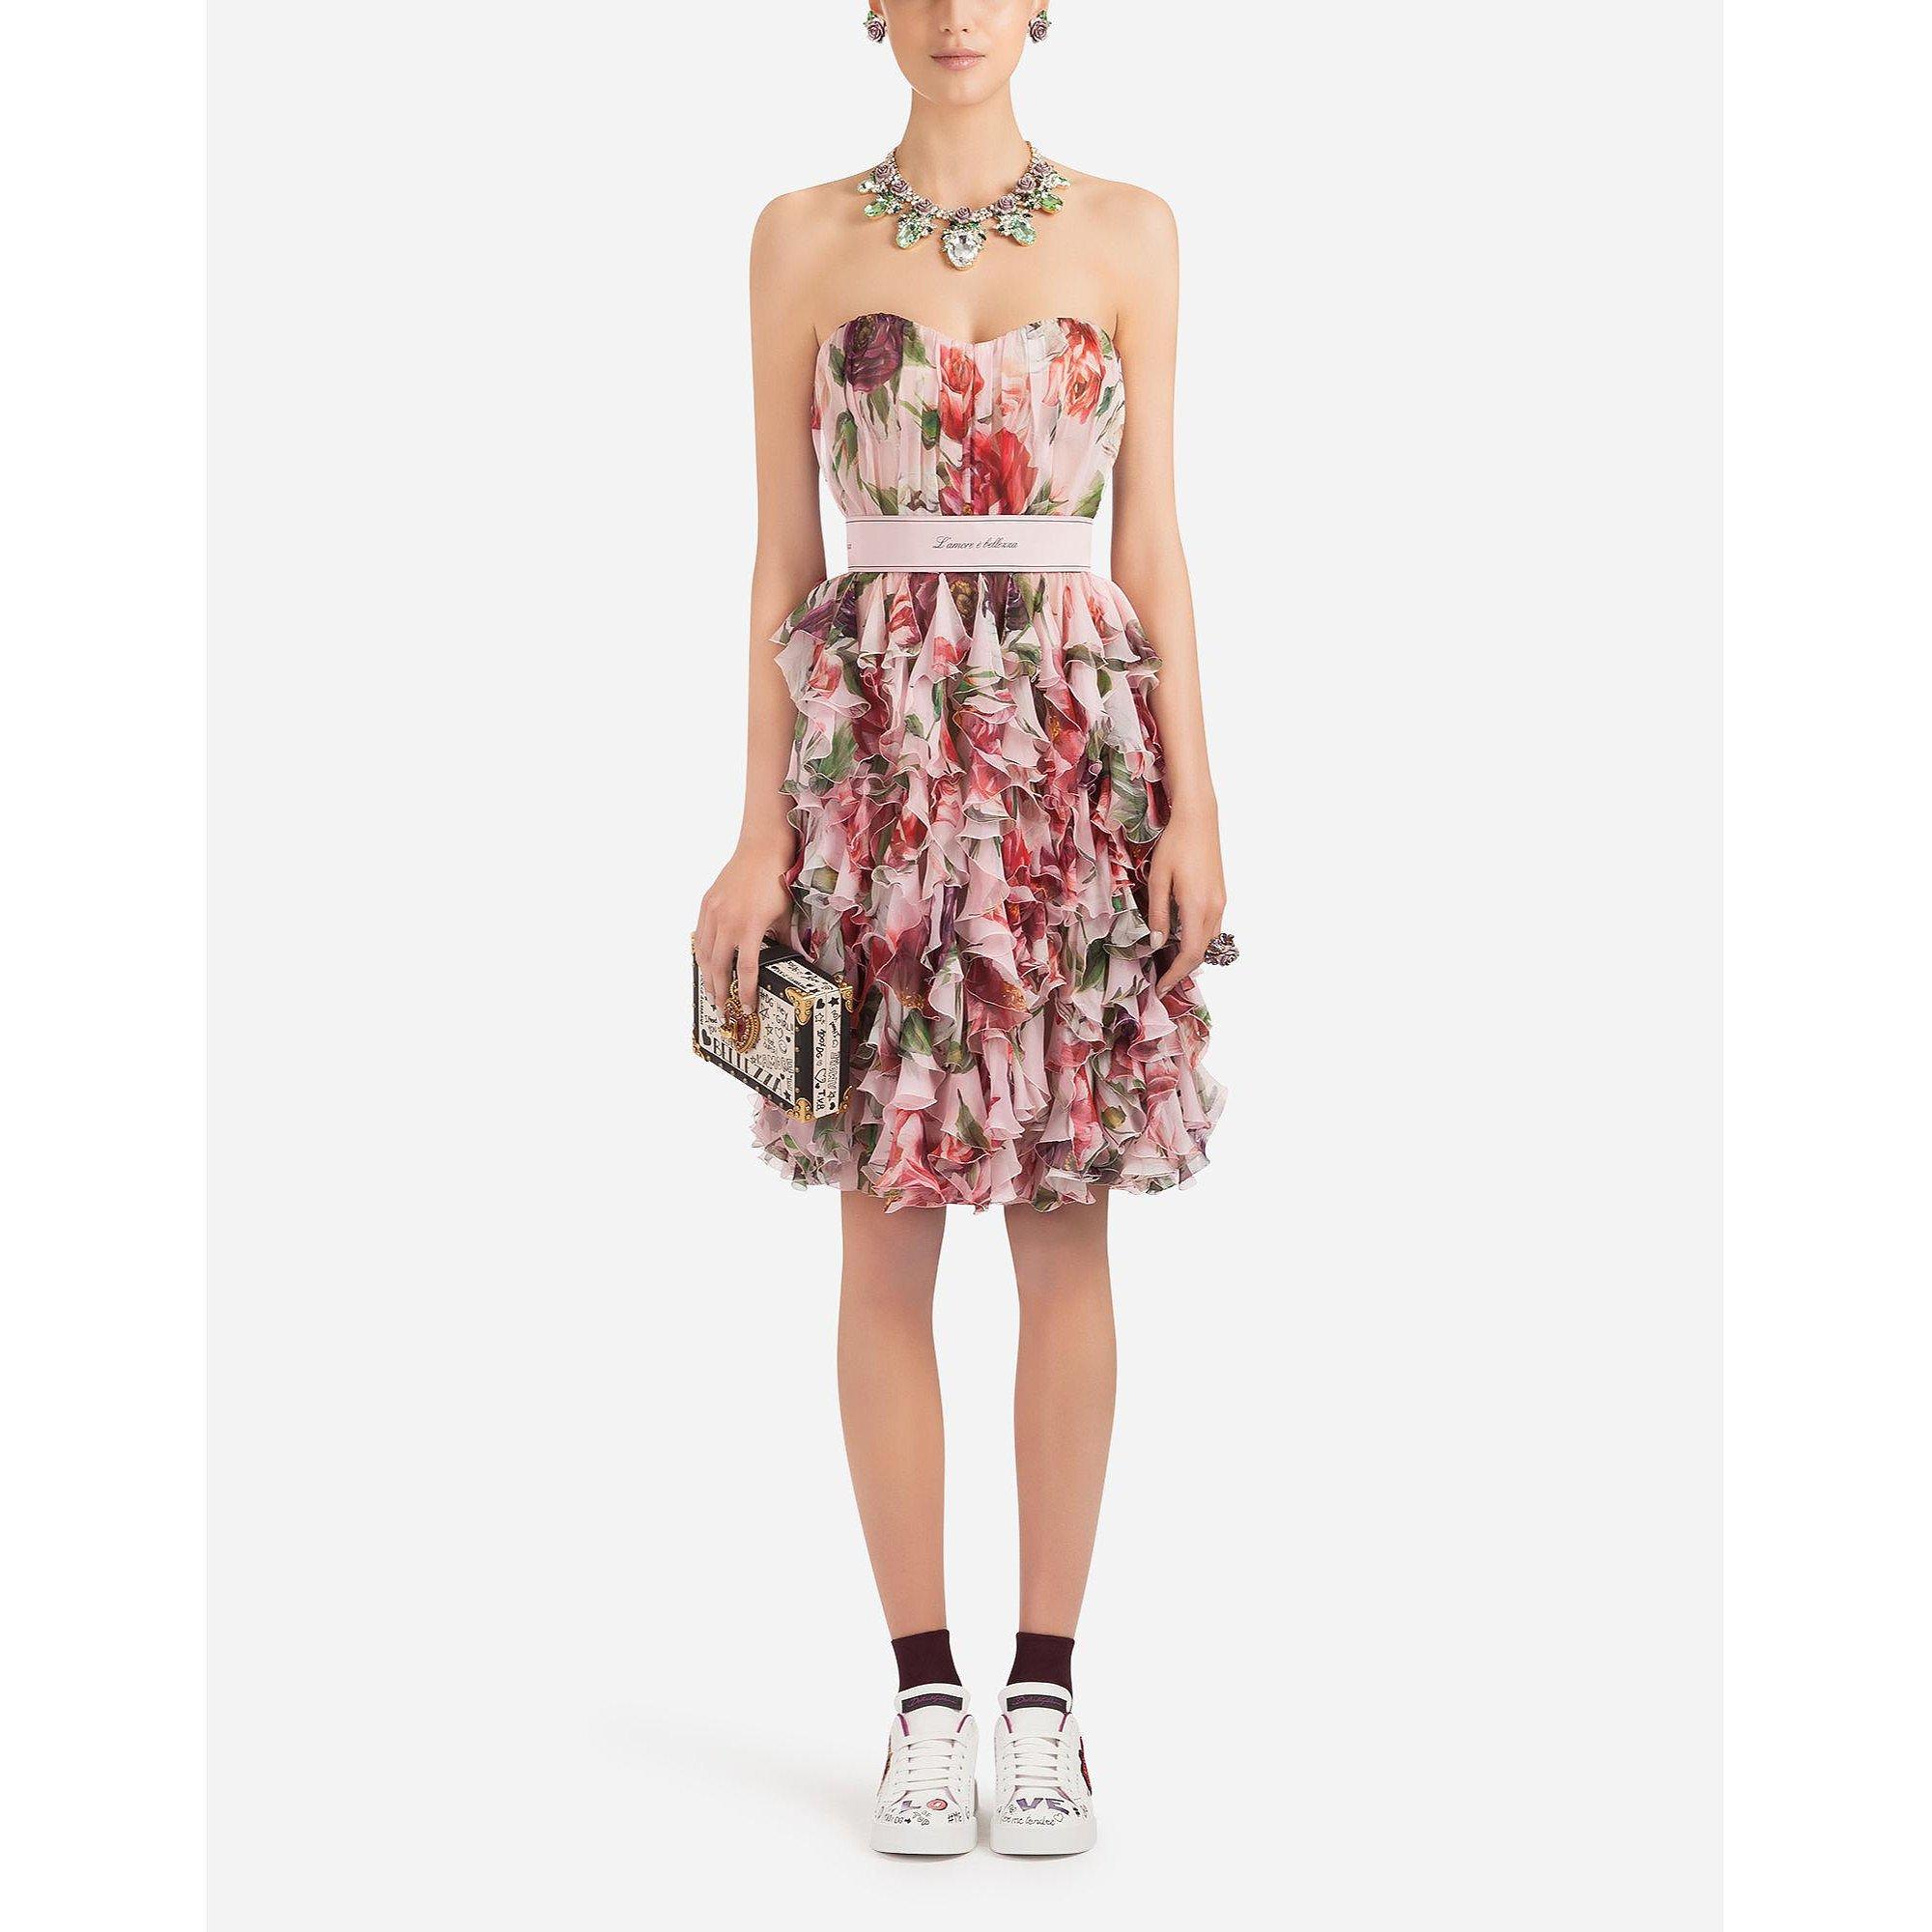 DOLCE & GABBANA Peony-Print Strapless Silk-Chiffon Dress